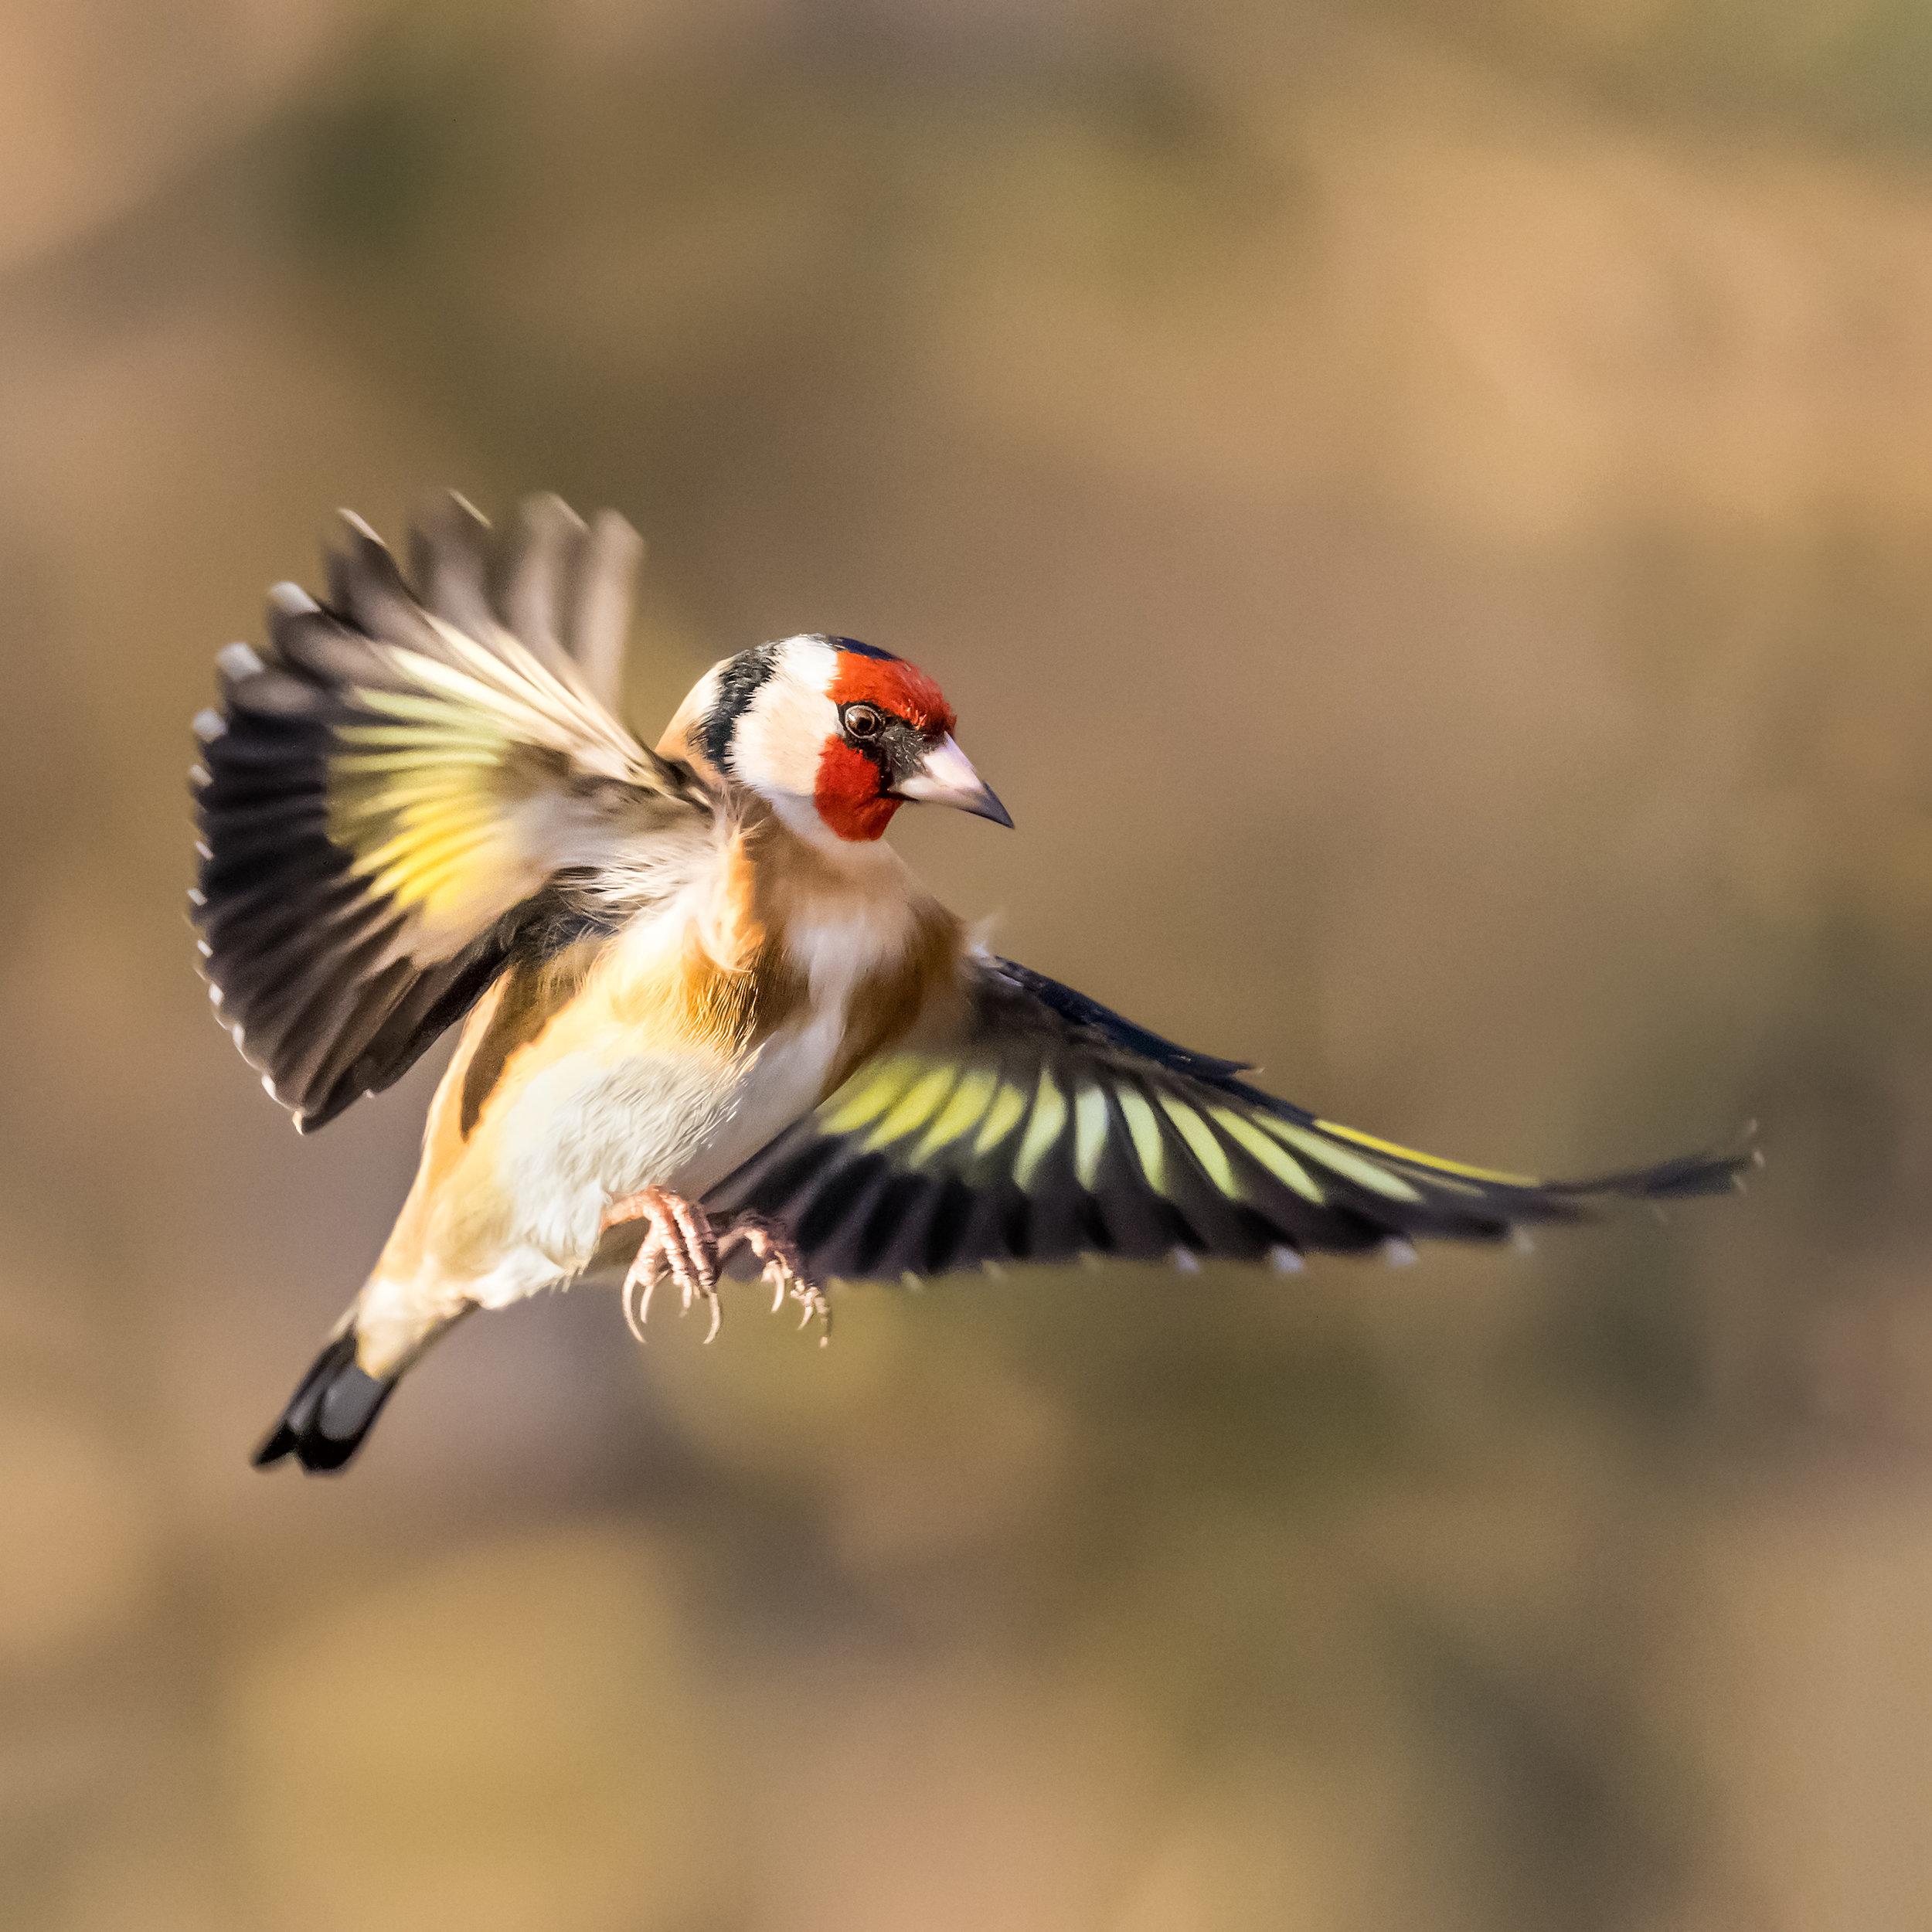 Goldfinch flight #1